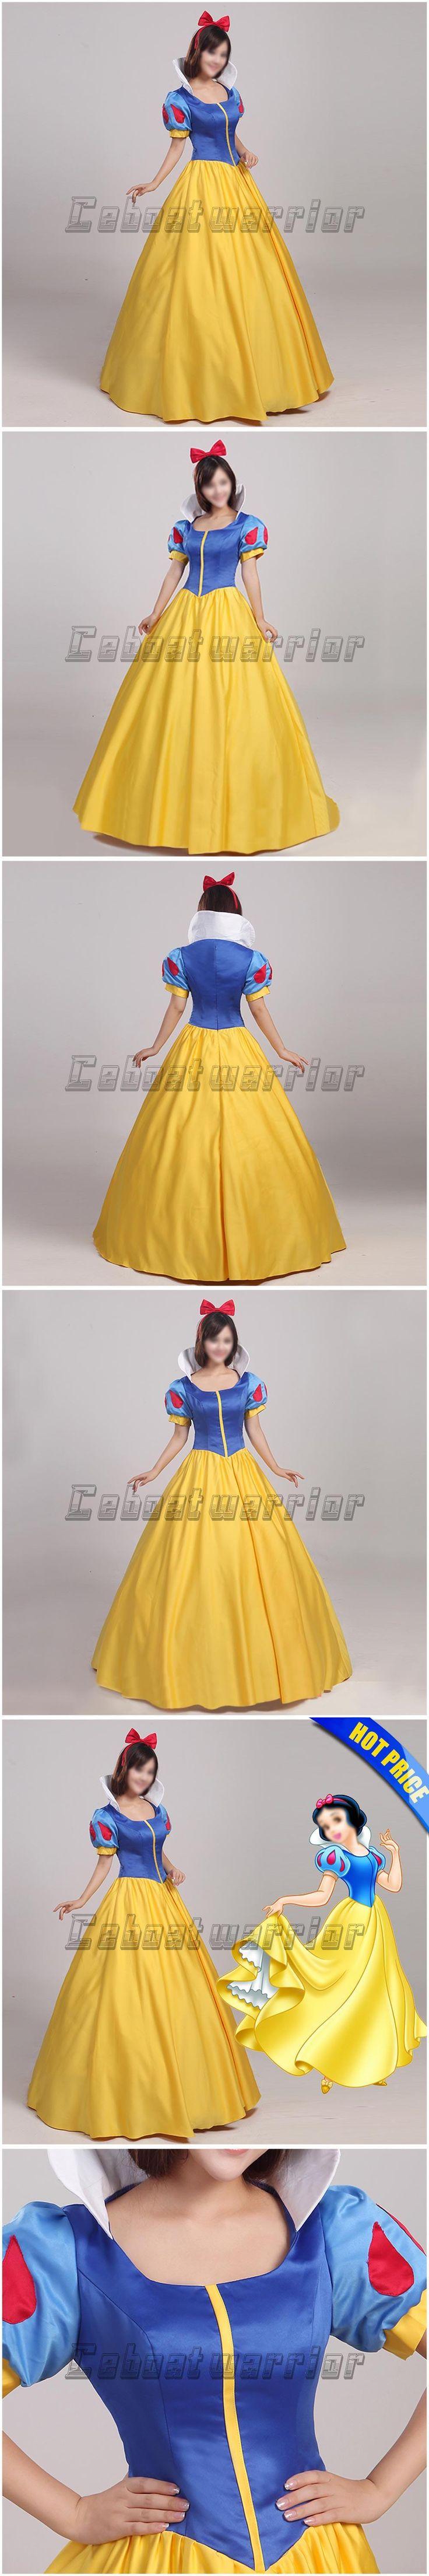 Snow White costume adult Princess snow white cosplay dress headband Custom made